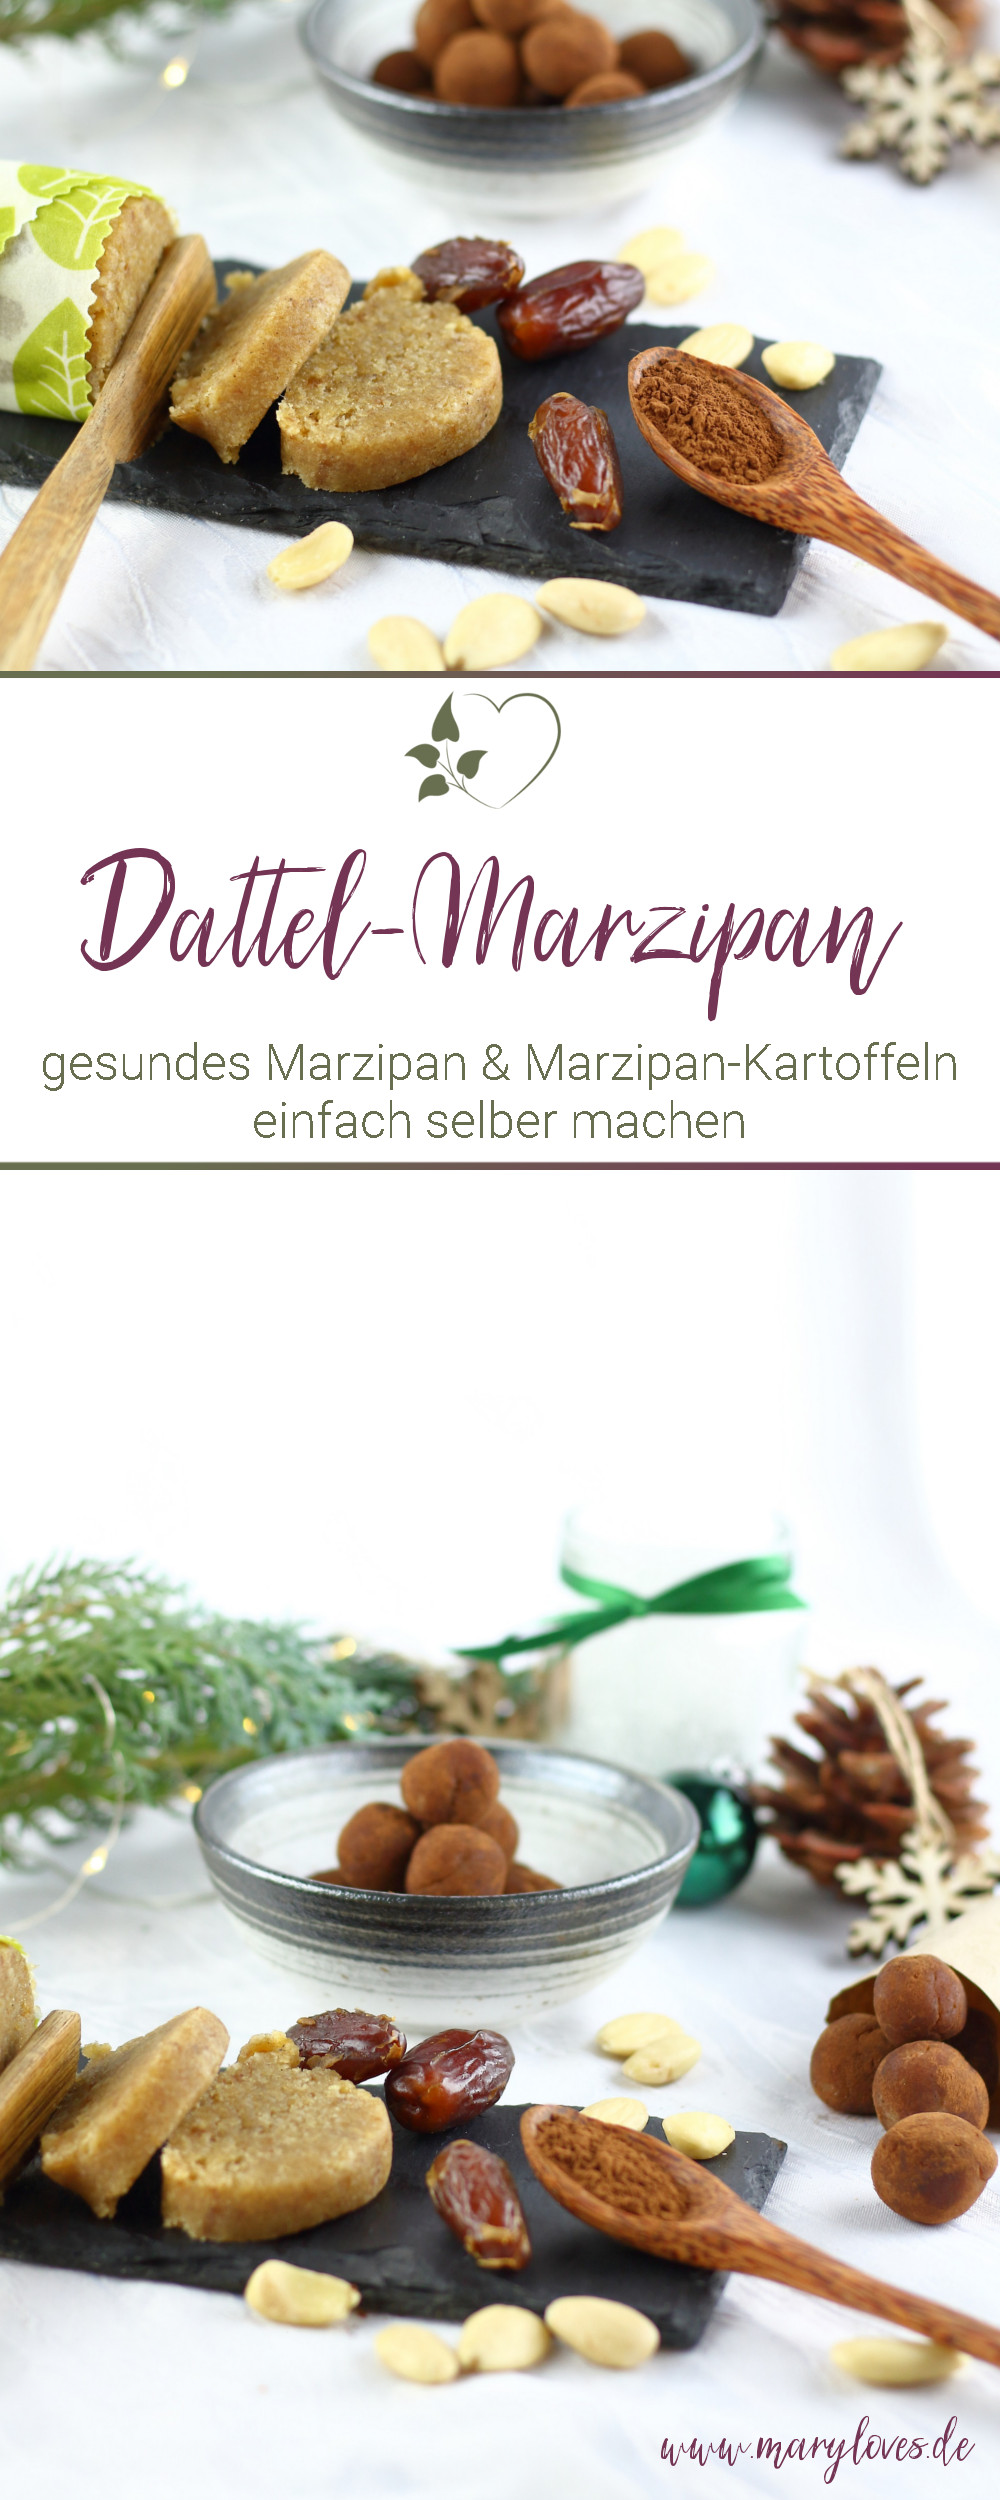 Selbstgemachtes Dattel-Marzipan & gesunde Marzipan-Kartoffeln - #marzipan #dattelmarzipan #zuckerfrei #zuckerfreiesmarzipan #marzipankartoffeln #küchengeschenk